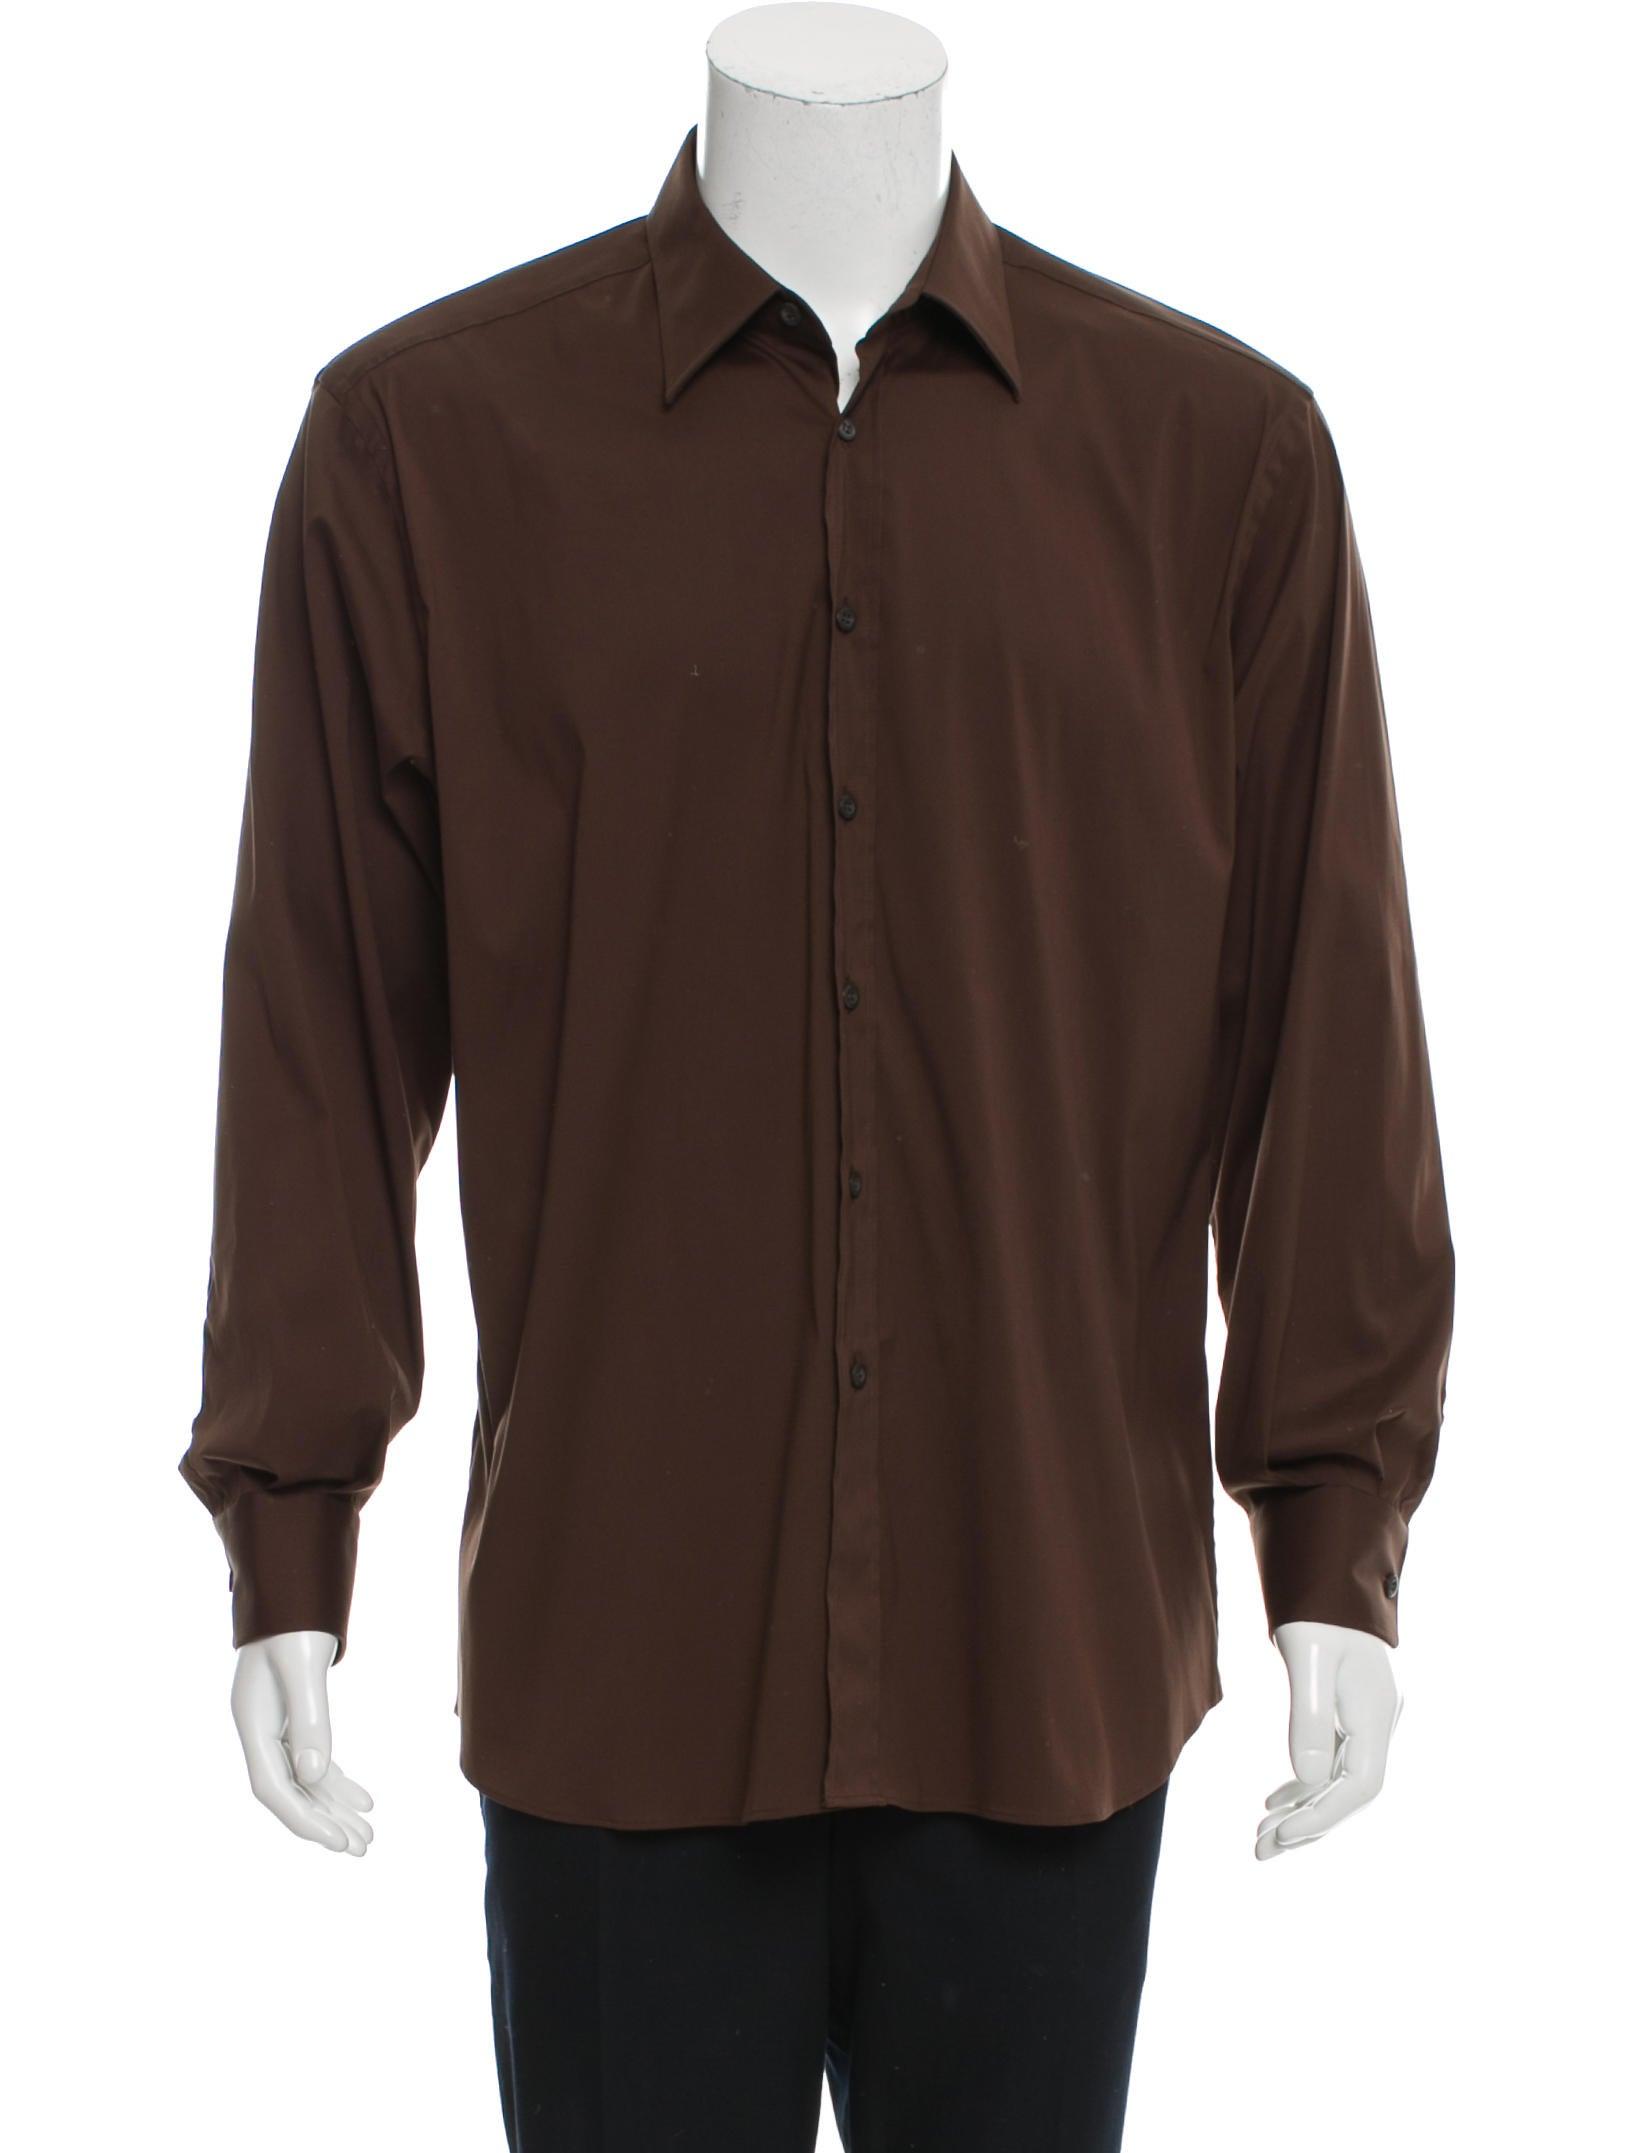 Prada Long Sleeve Button Up Shirt Clothing Pra147912